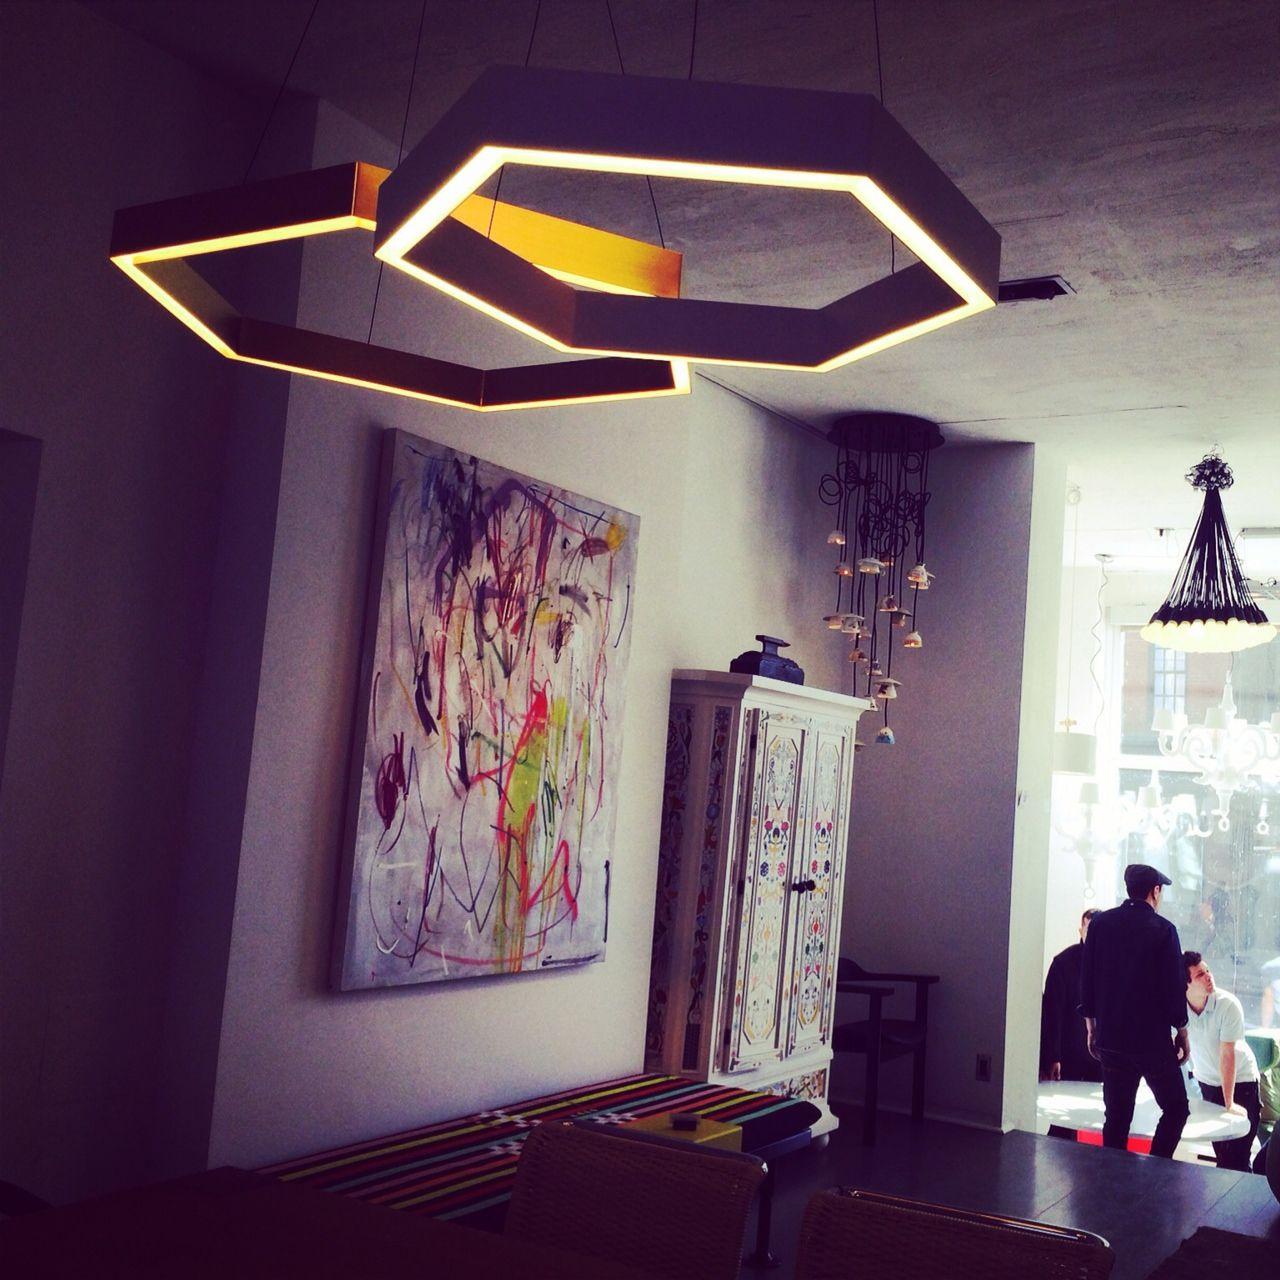 Studio Lighting Nz: Hex Pendant Light By Resident Studio, NZ